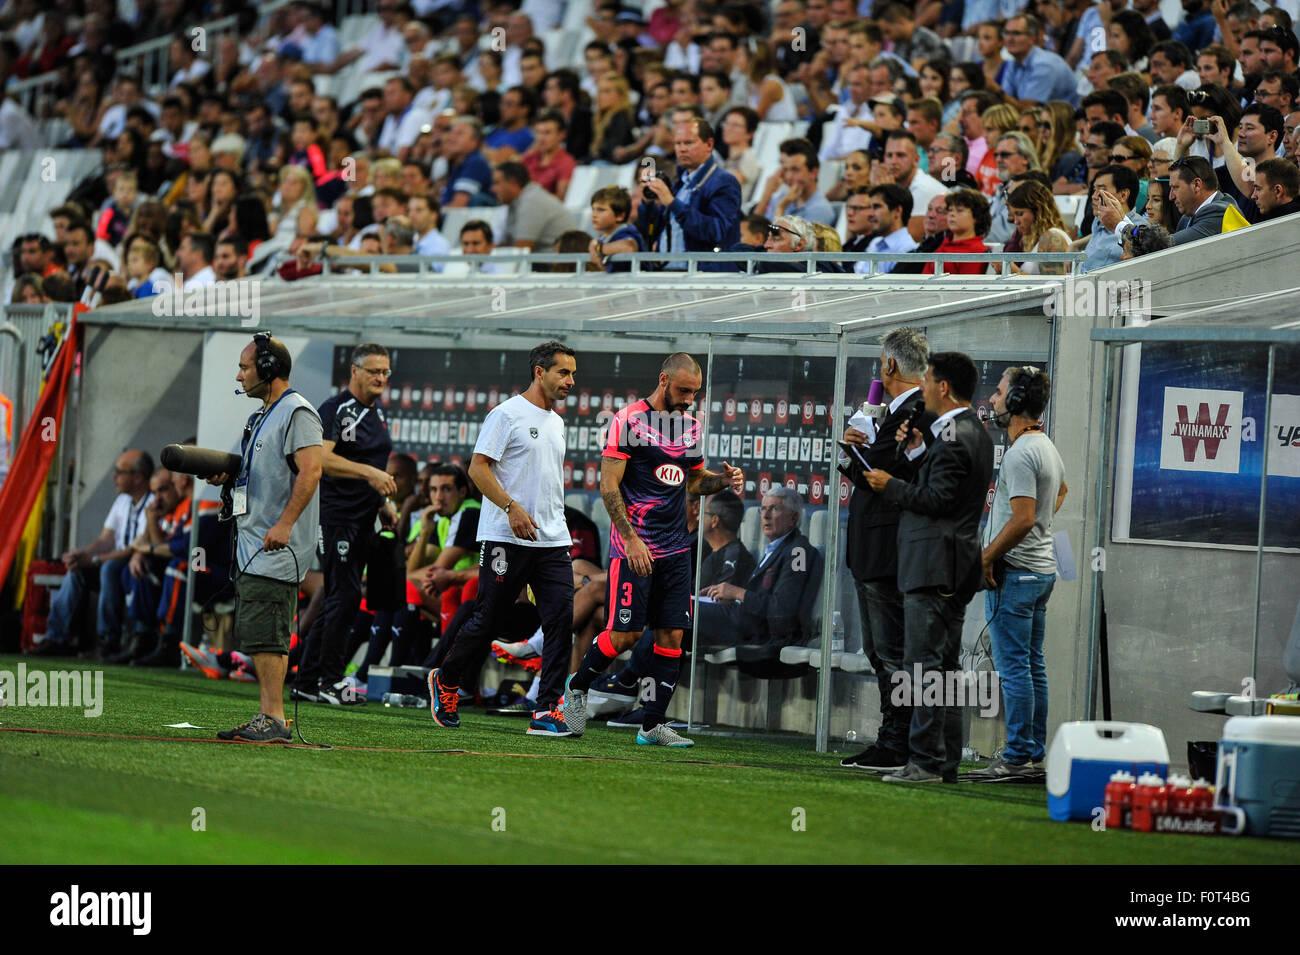 Bordeaux, Francia. 20 agosto 2015. Europa League qualification round preliminari. Bordeaux versus Kairat Almaty. Immagini Stock